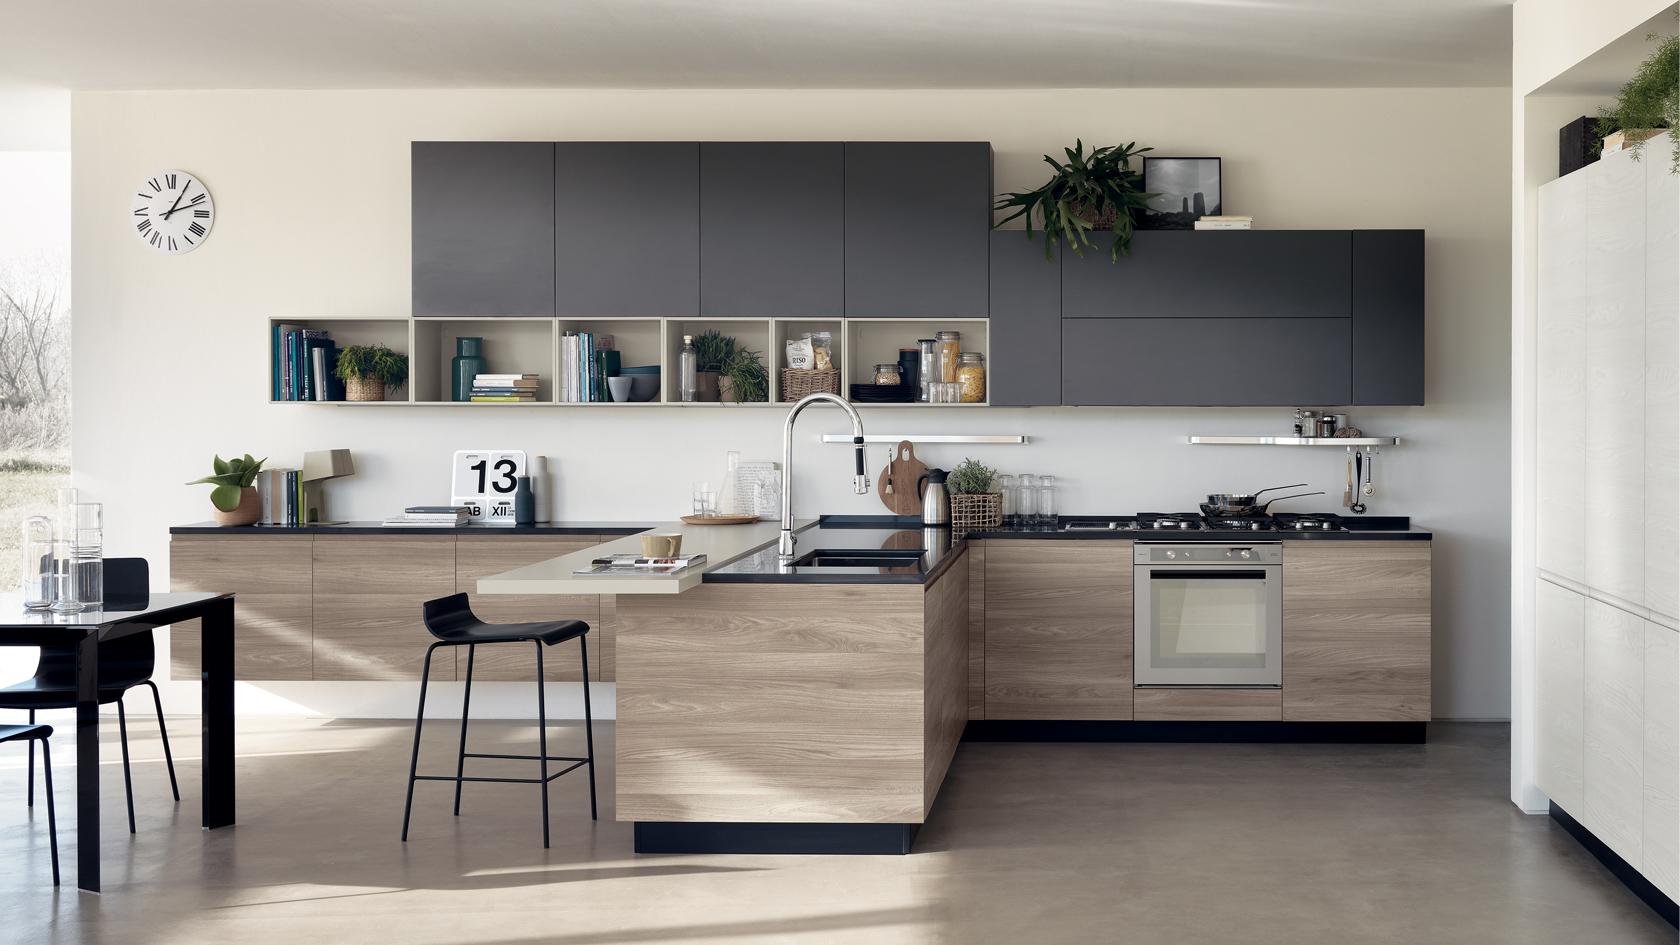 Catalogo Cucine Scavolini Moderne 2019.Cucina Moderna Scavolini Motus Mobili Incardone